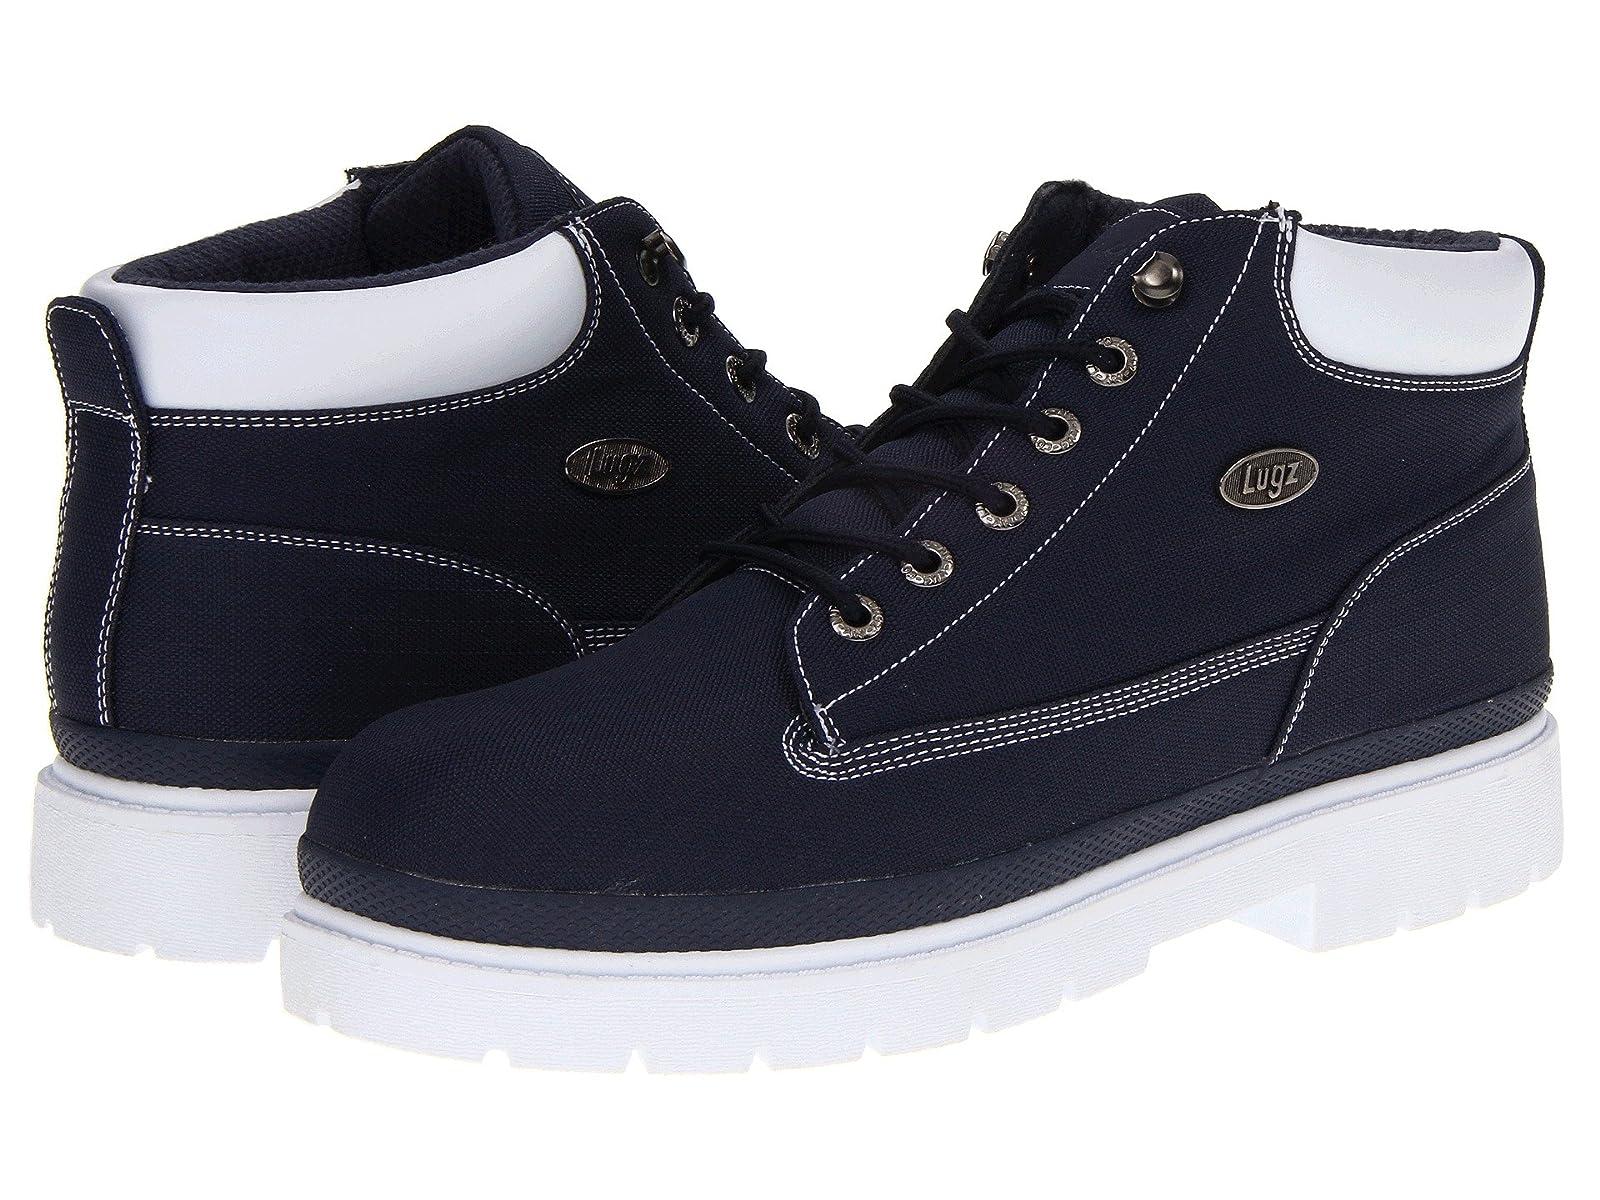 Lugz Drifter - RipstopCheap and distinctive eye-catching shoes